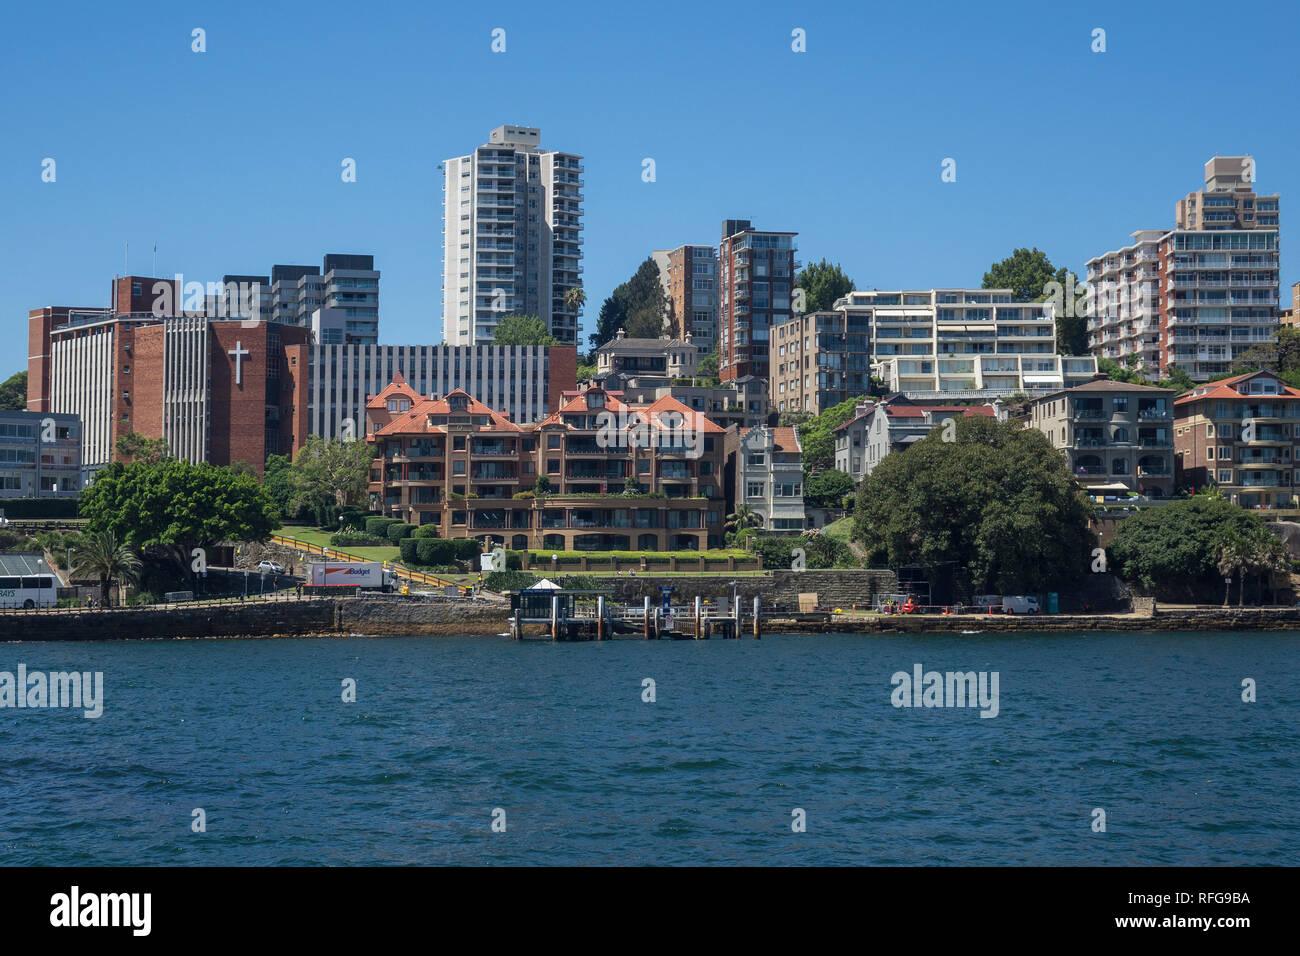 Australia, New South Wales, Sydney, Kirribilli skyline - Stock Image